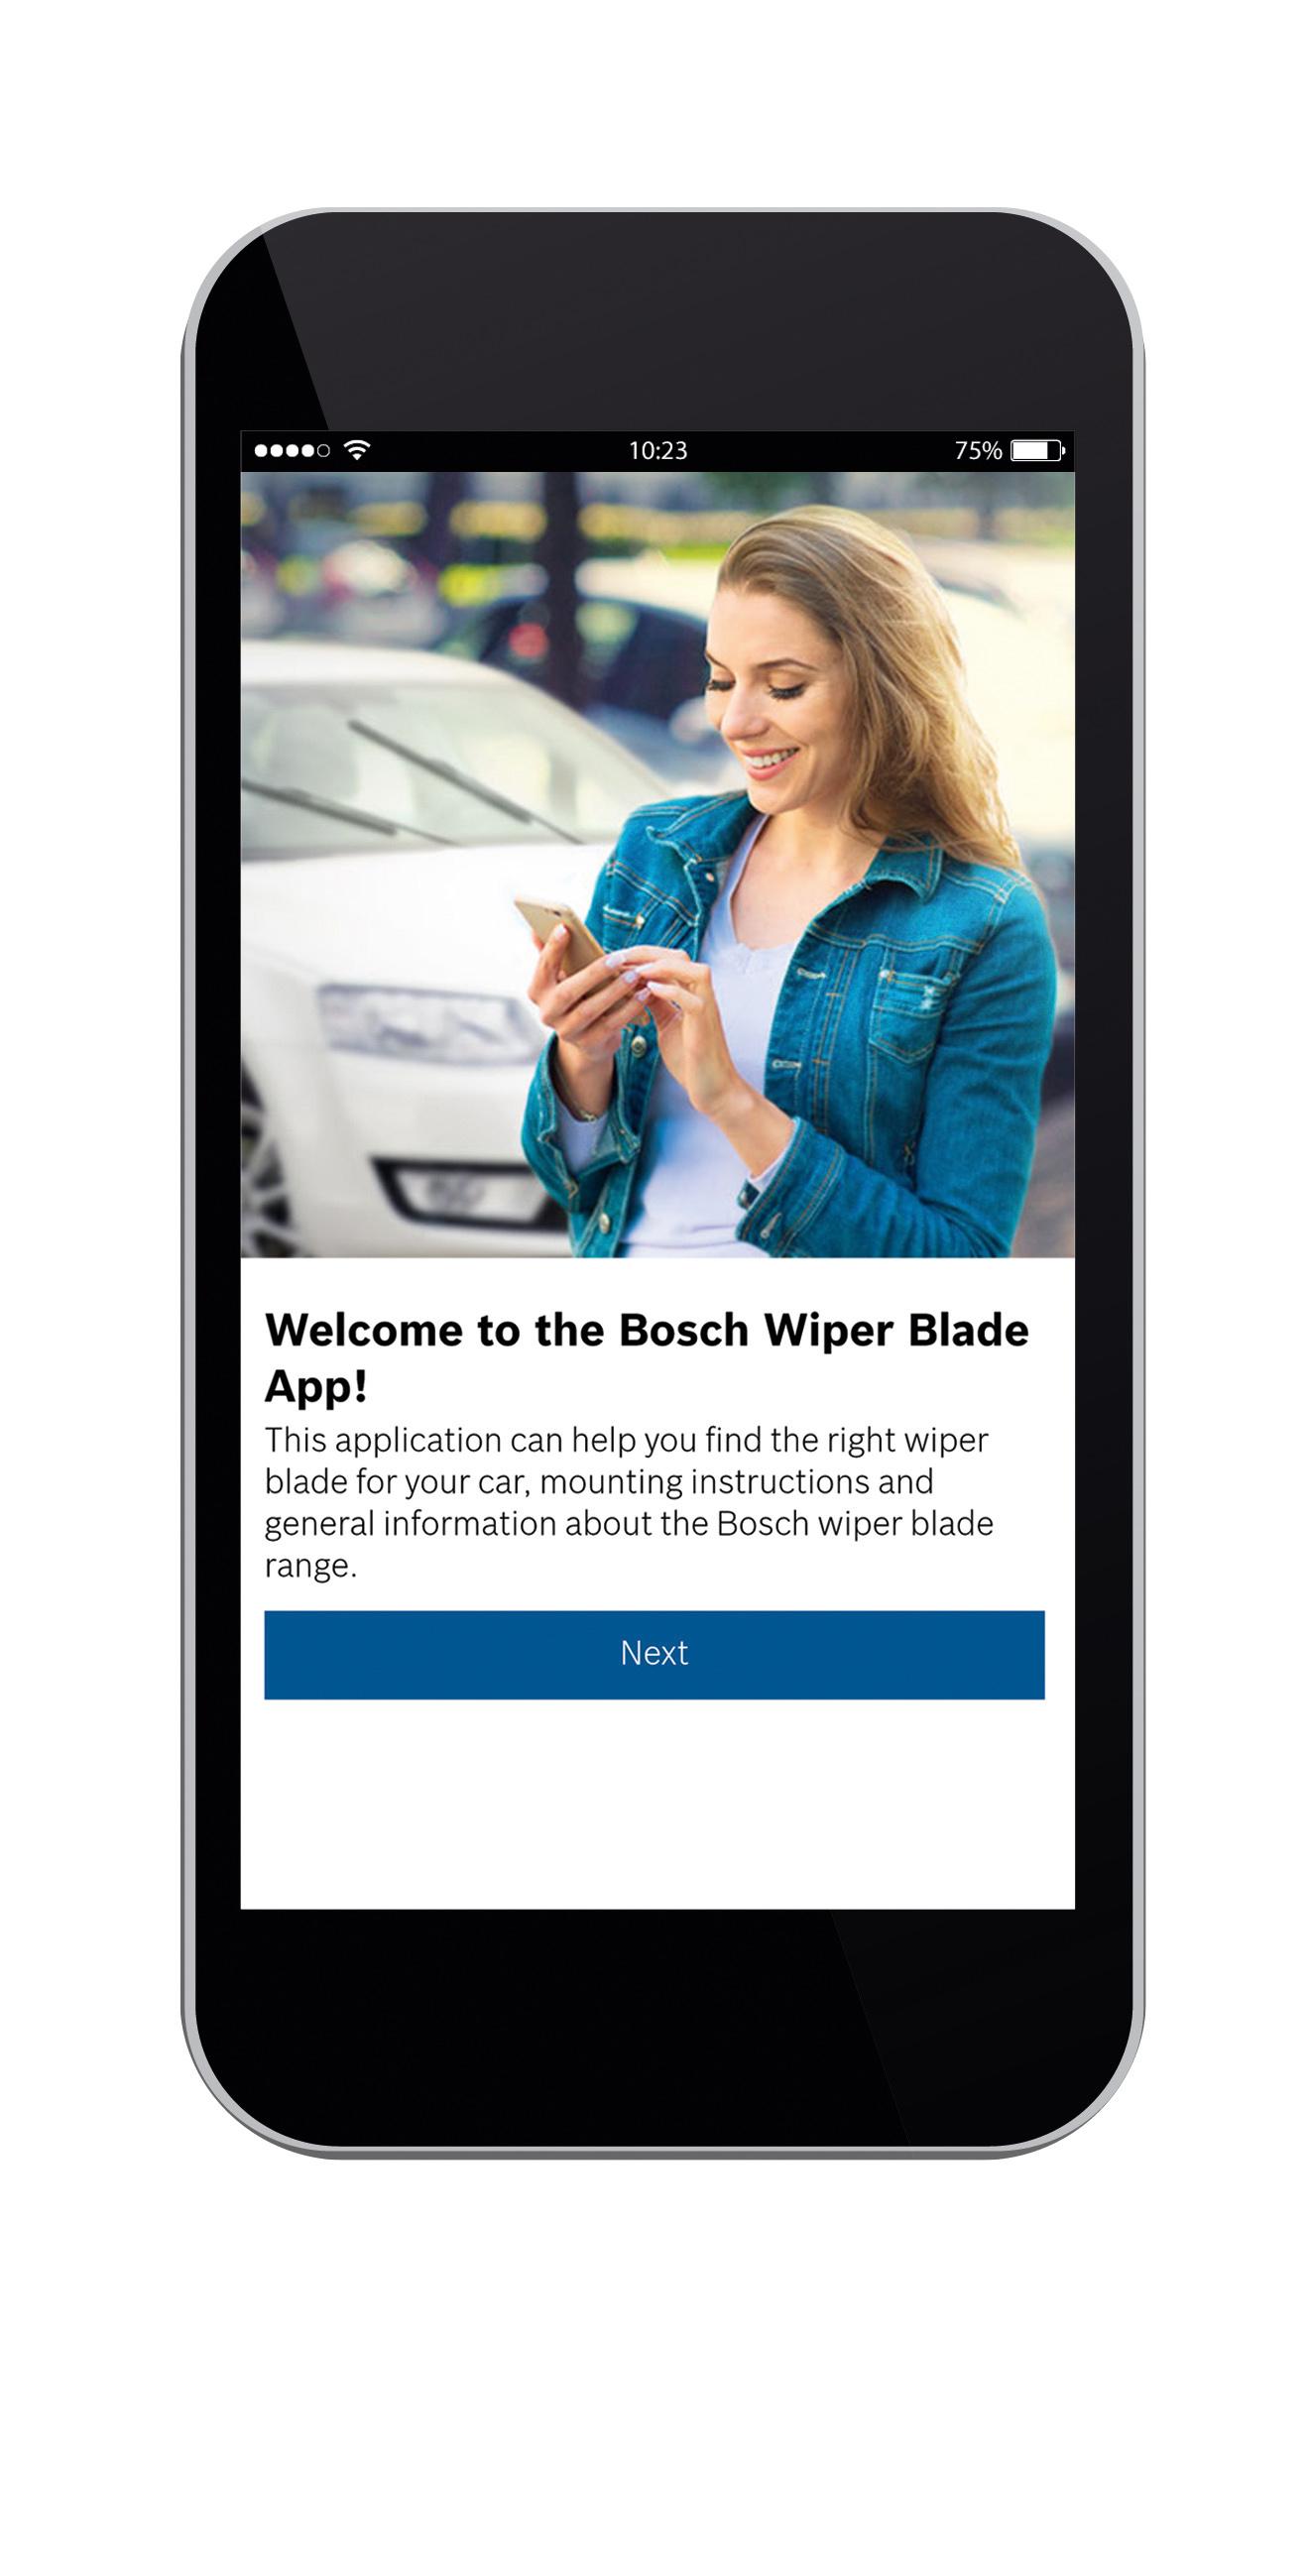 Bosch wiper app